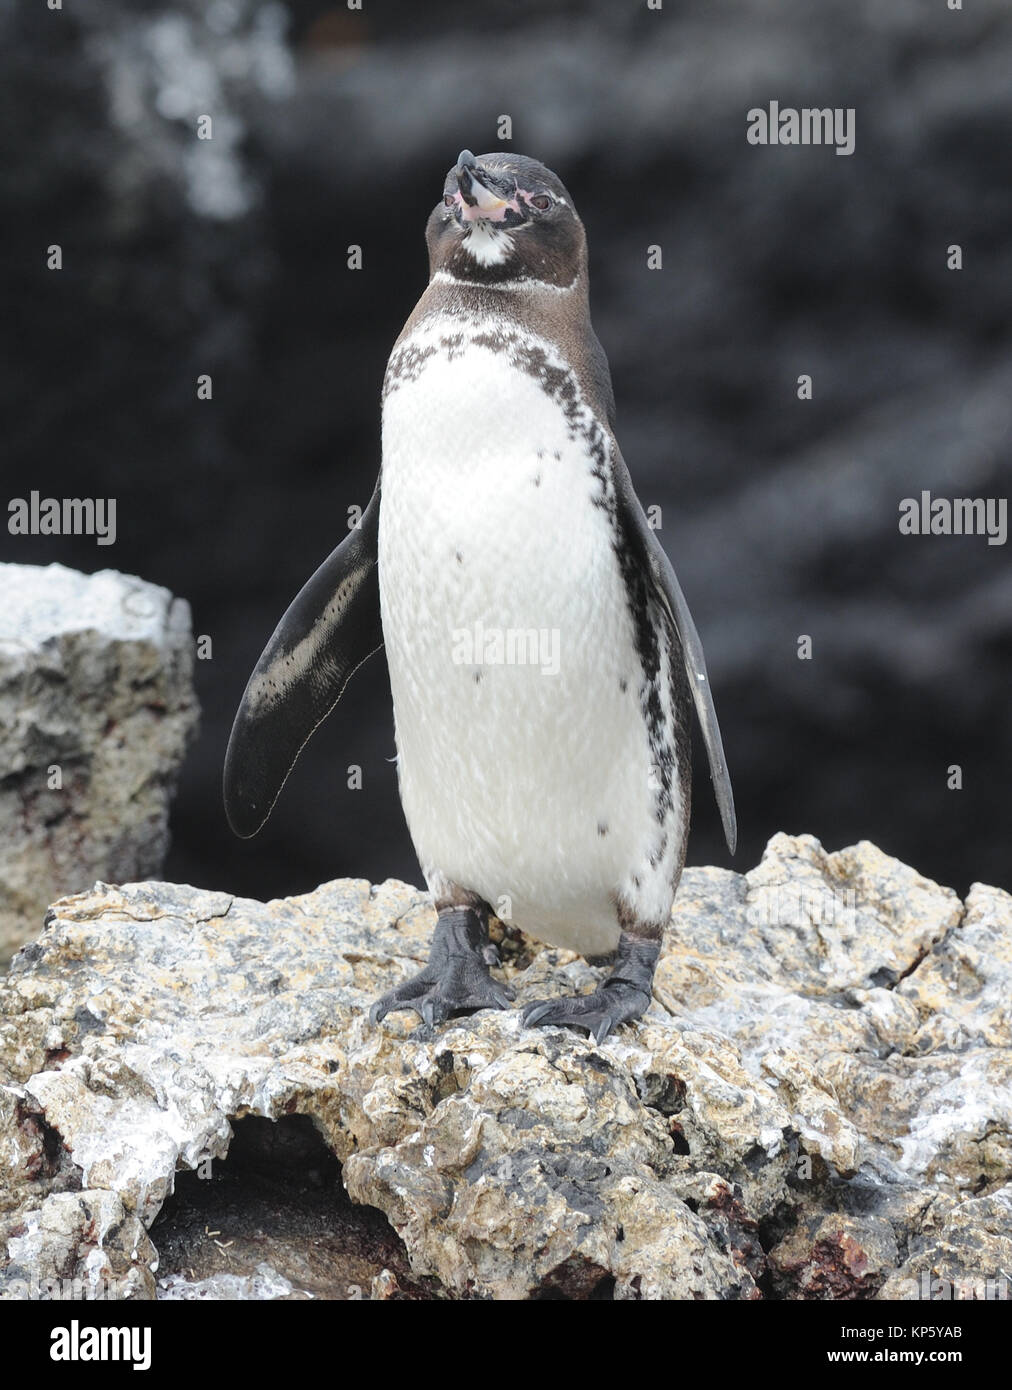 A Galápagos penguin (Spheniscus mendiculus) on the lava rocks of Las Tintoreras. Las Tintoreras, Puerto Villamil, - Stock Image